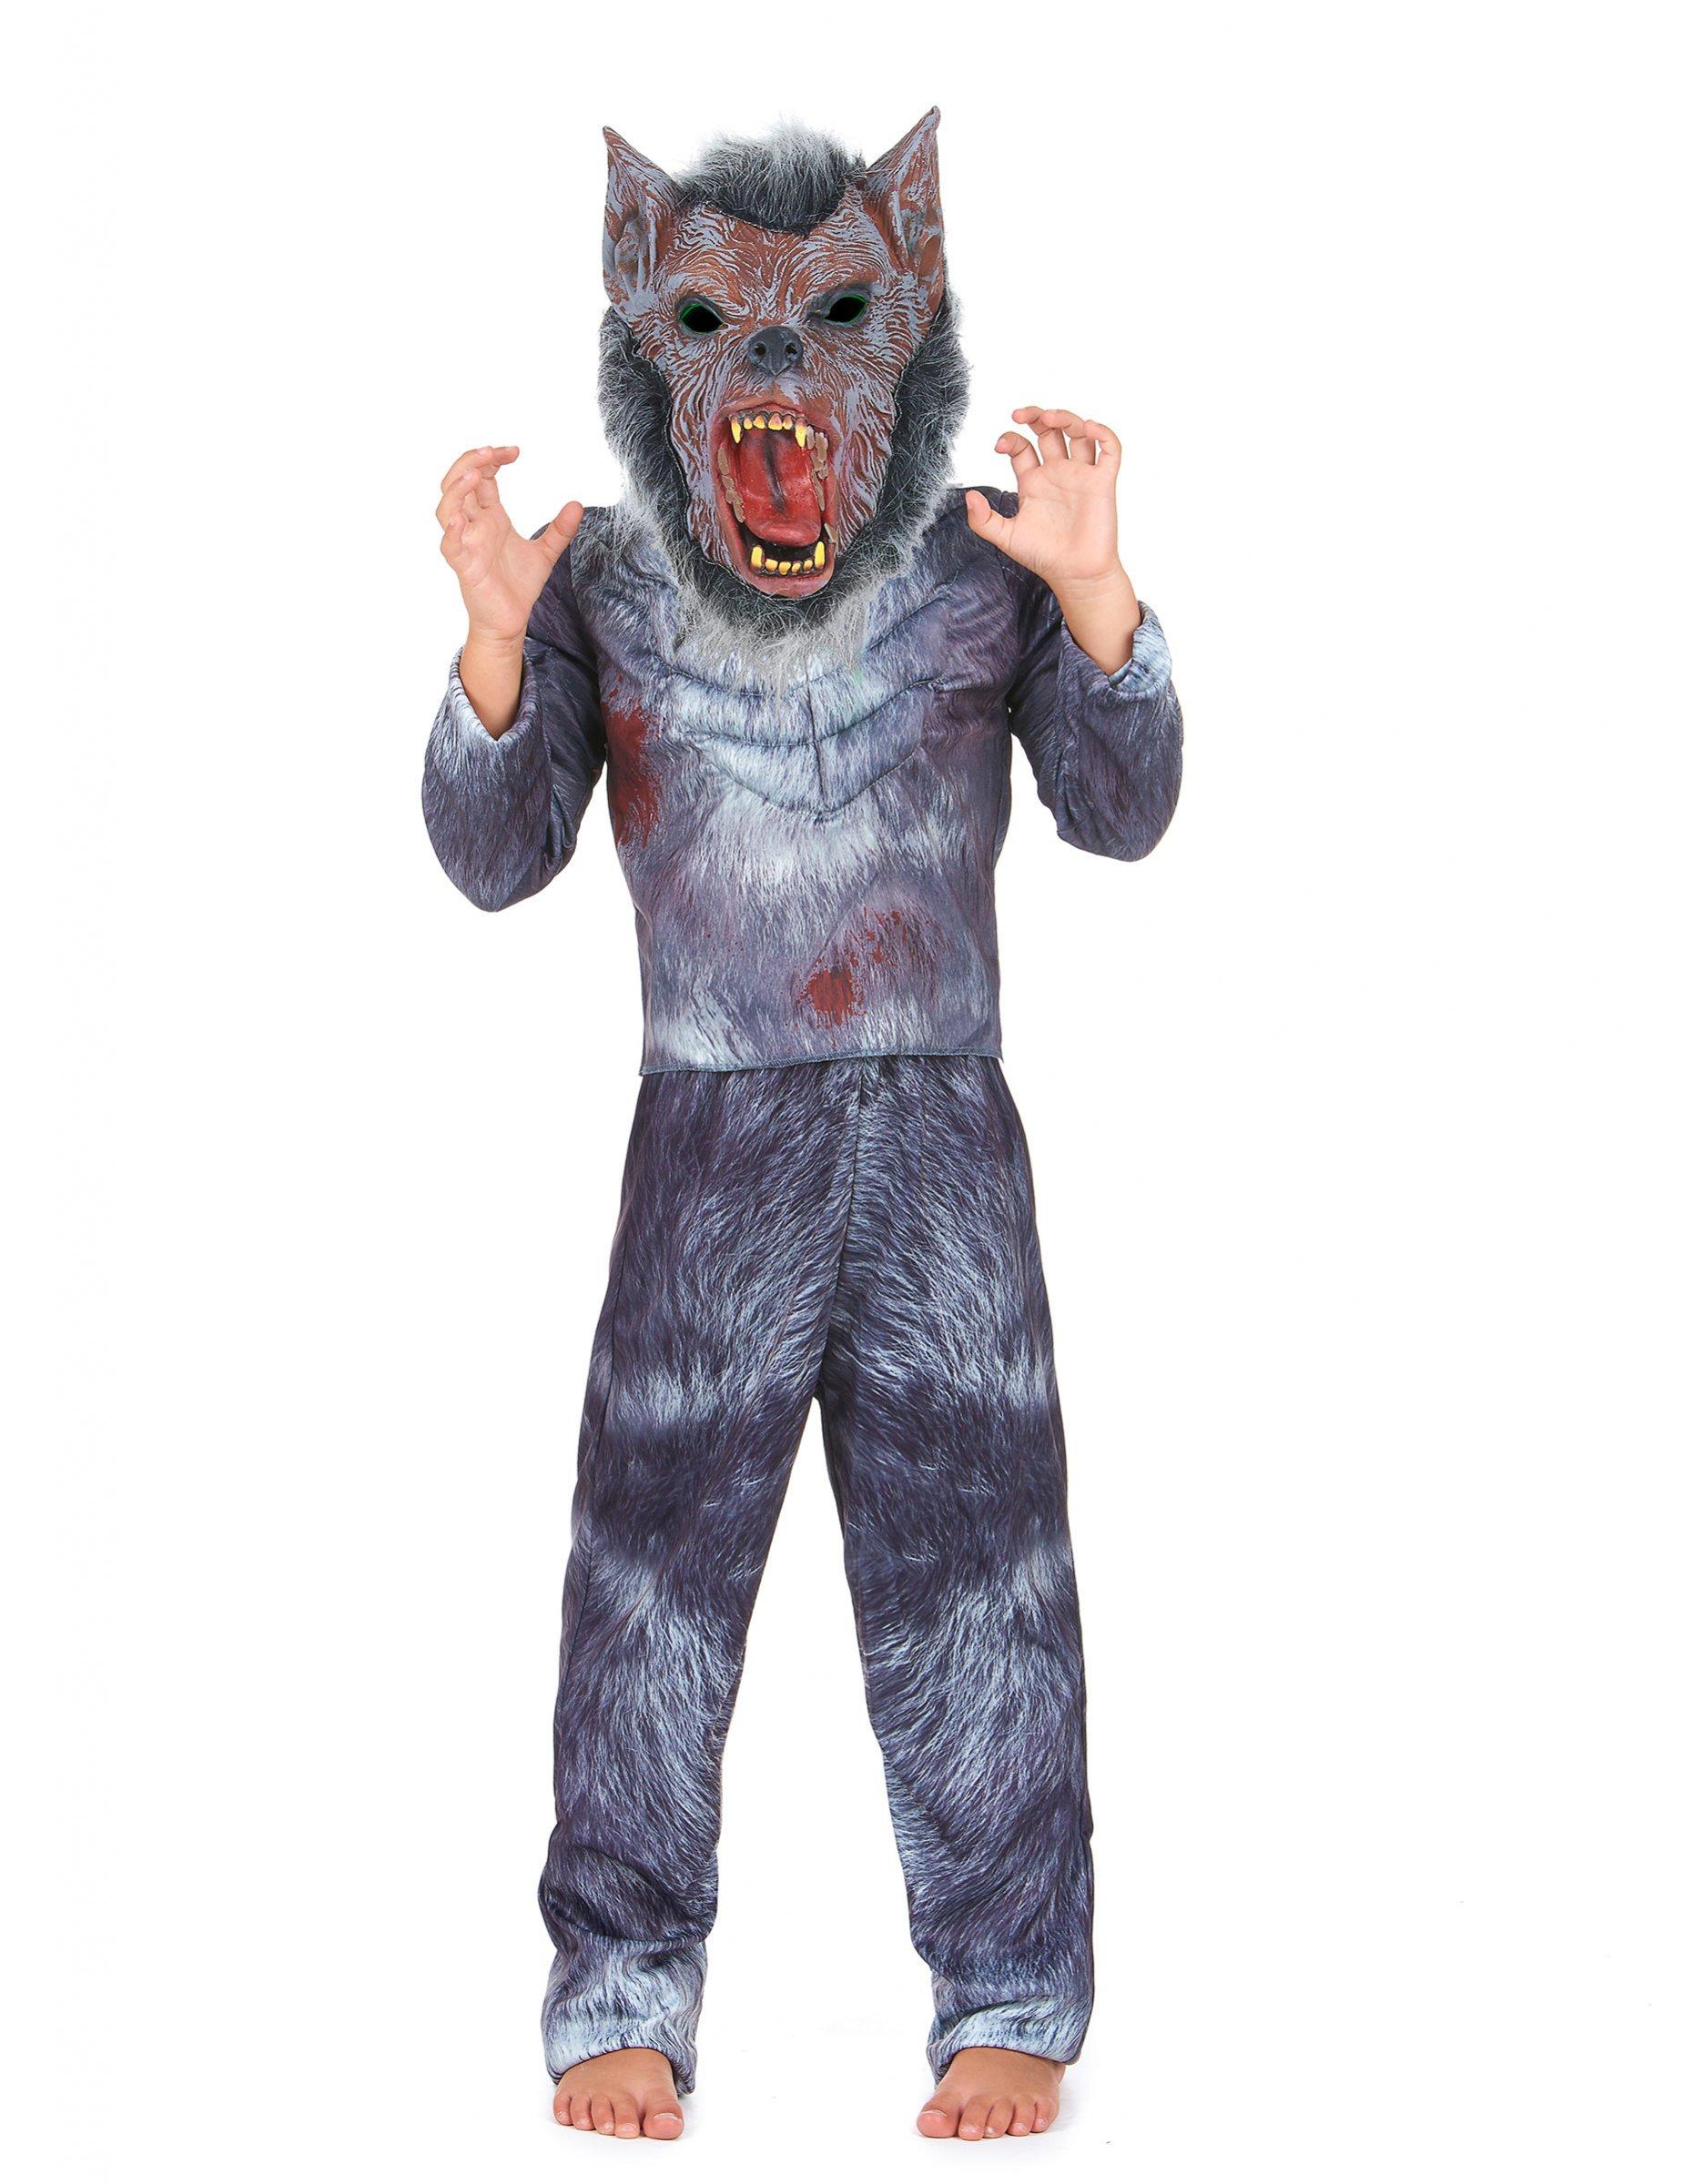 D guisement loup garou enfant deguise toi achat de - Lupo mannaro immagini da colorare ...